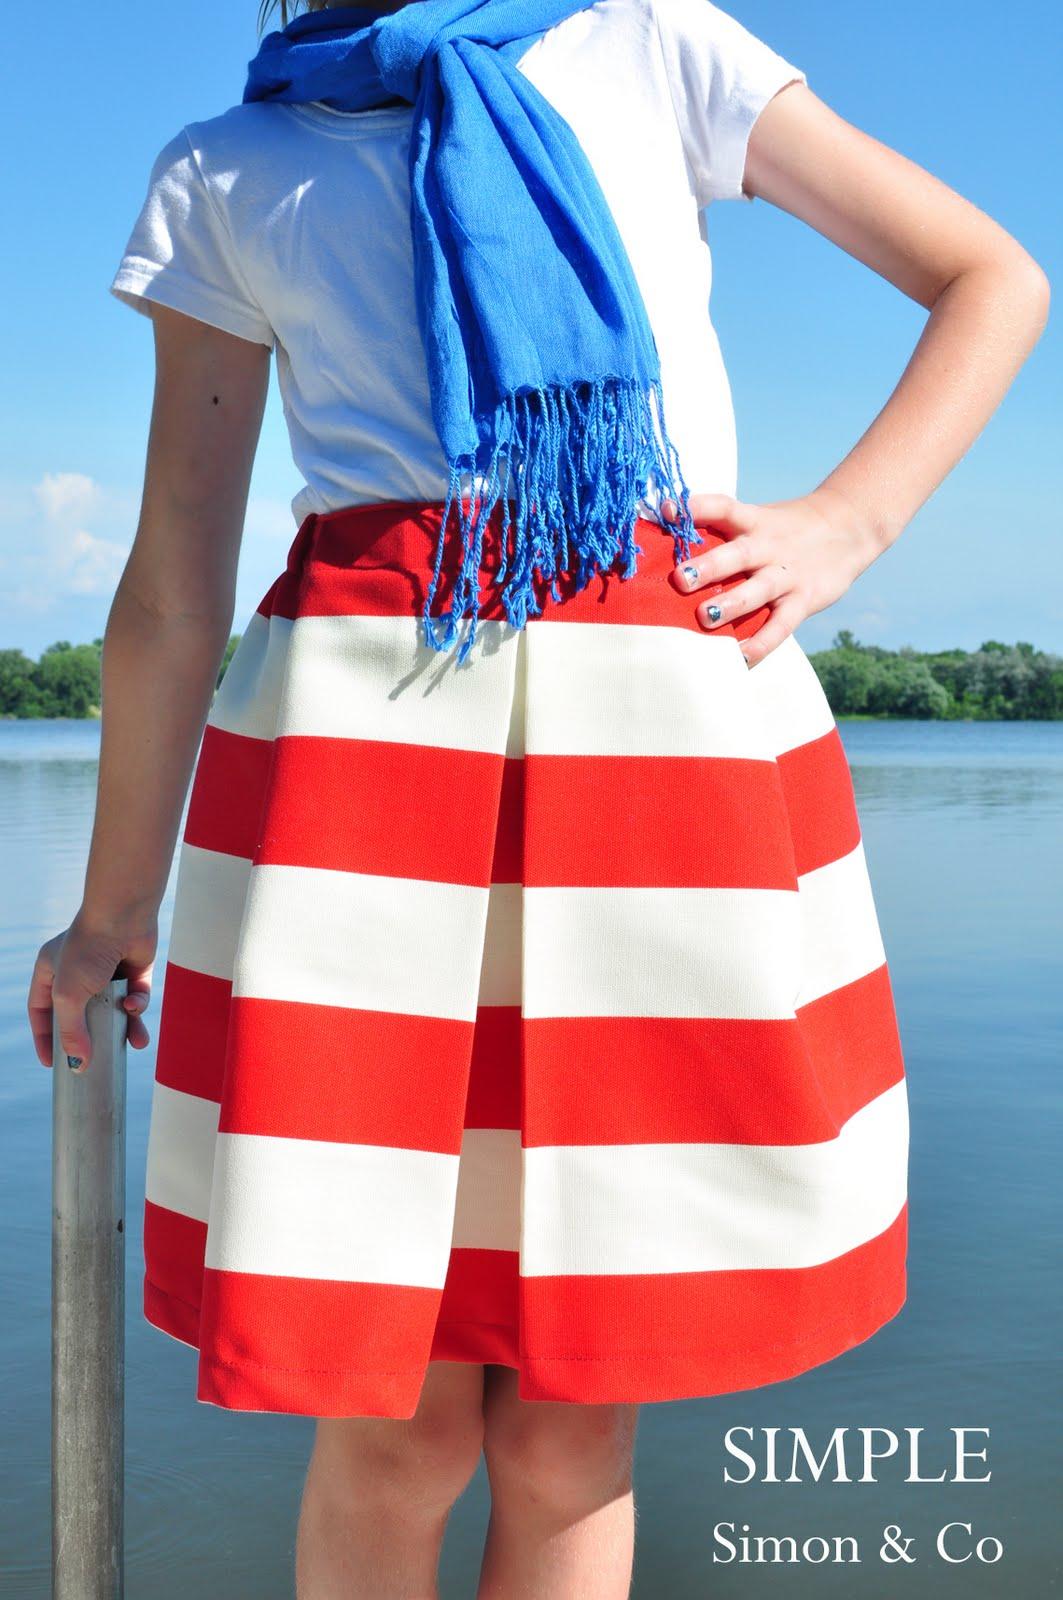 The Starboard Skirt